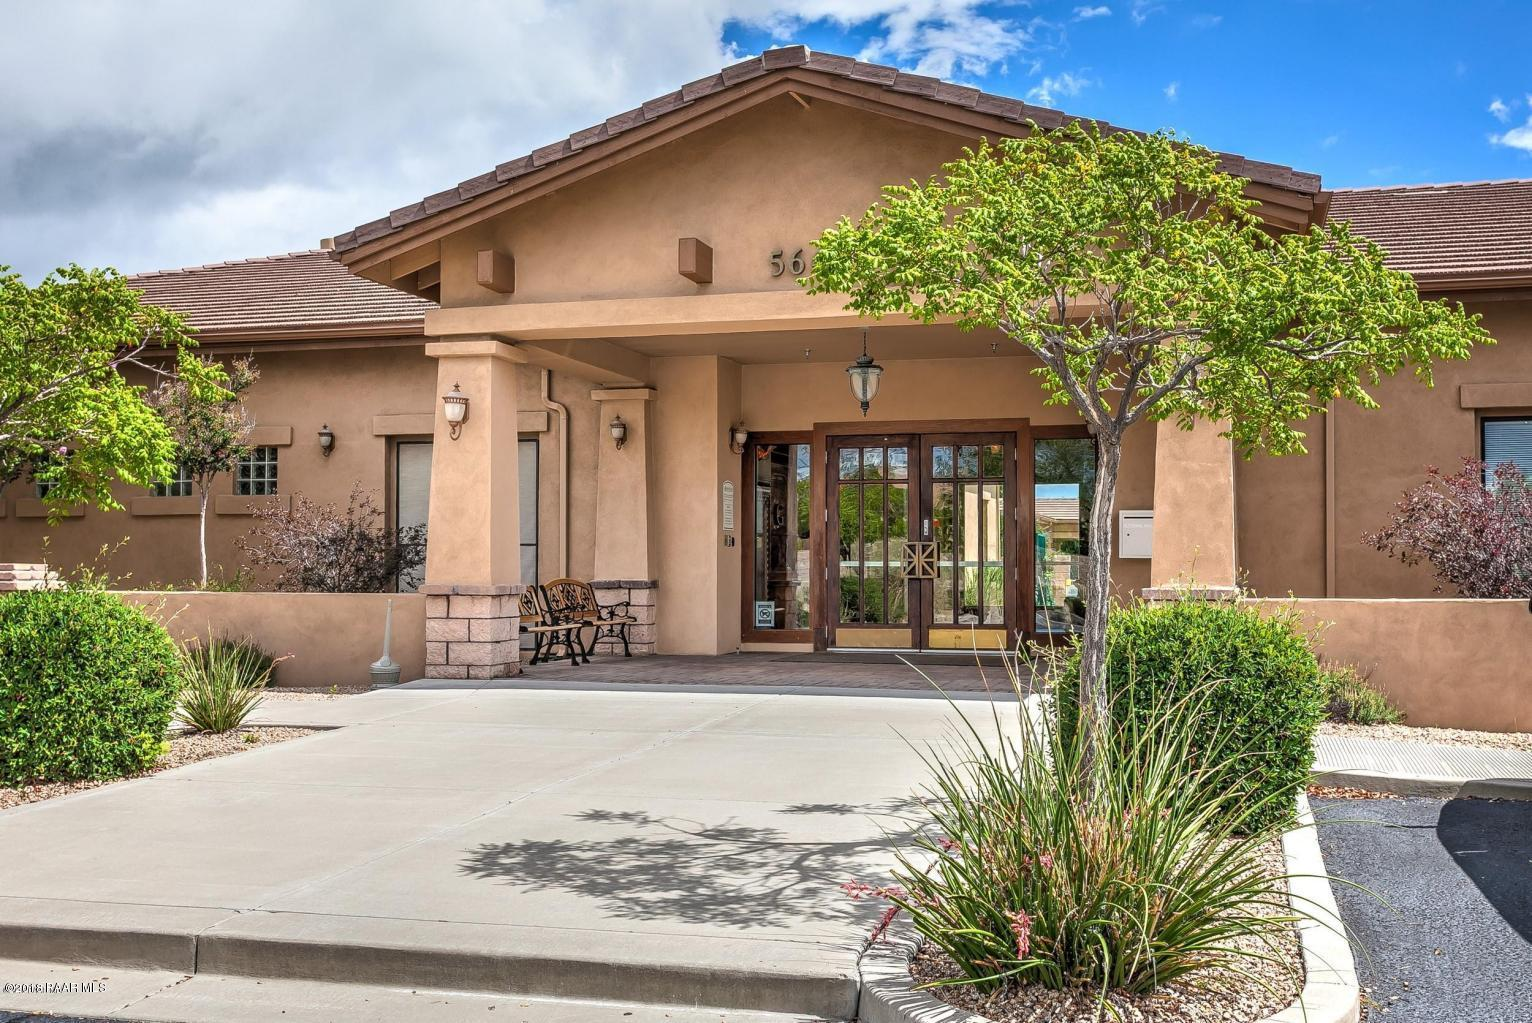 5337 N Bremont Way Prescott Valley, AZ 86314 - MLS #: 1015259